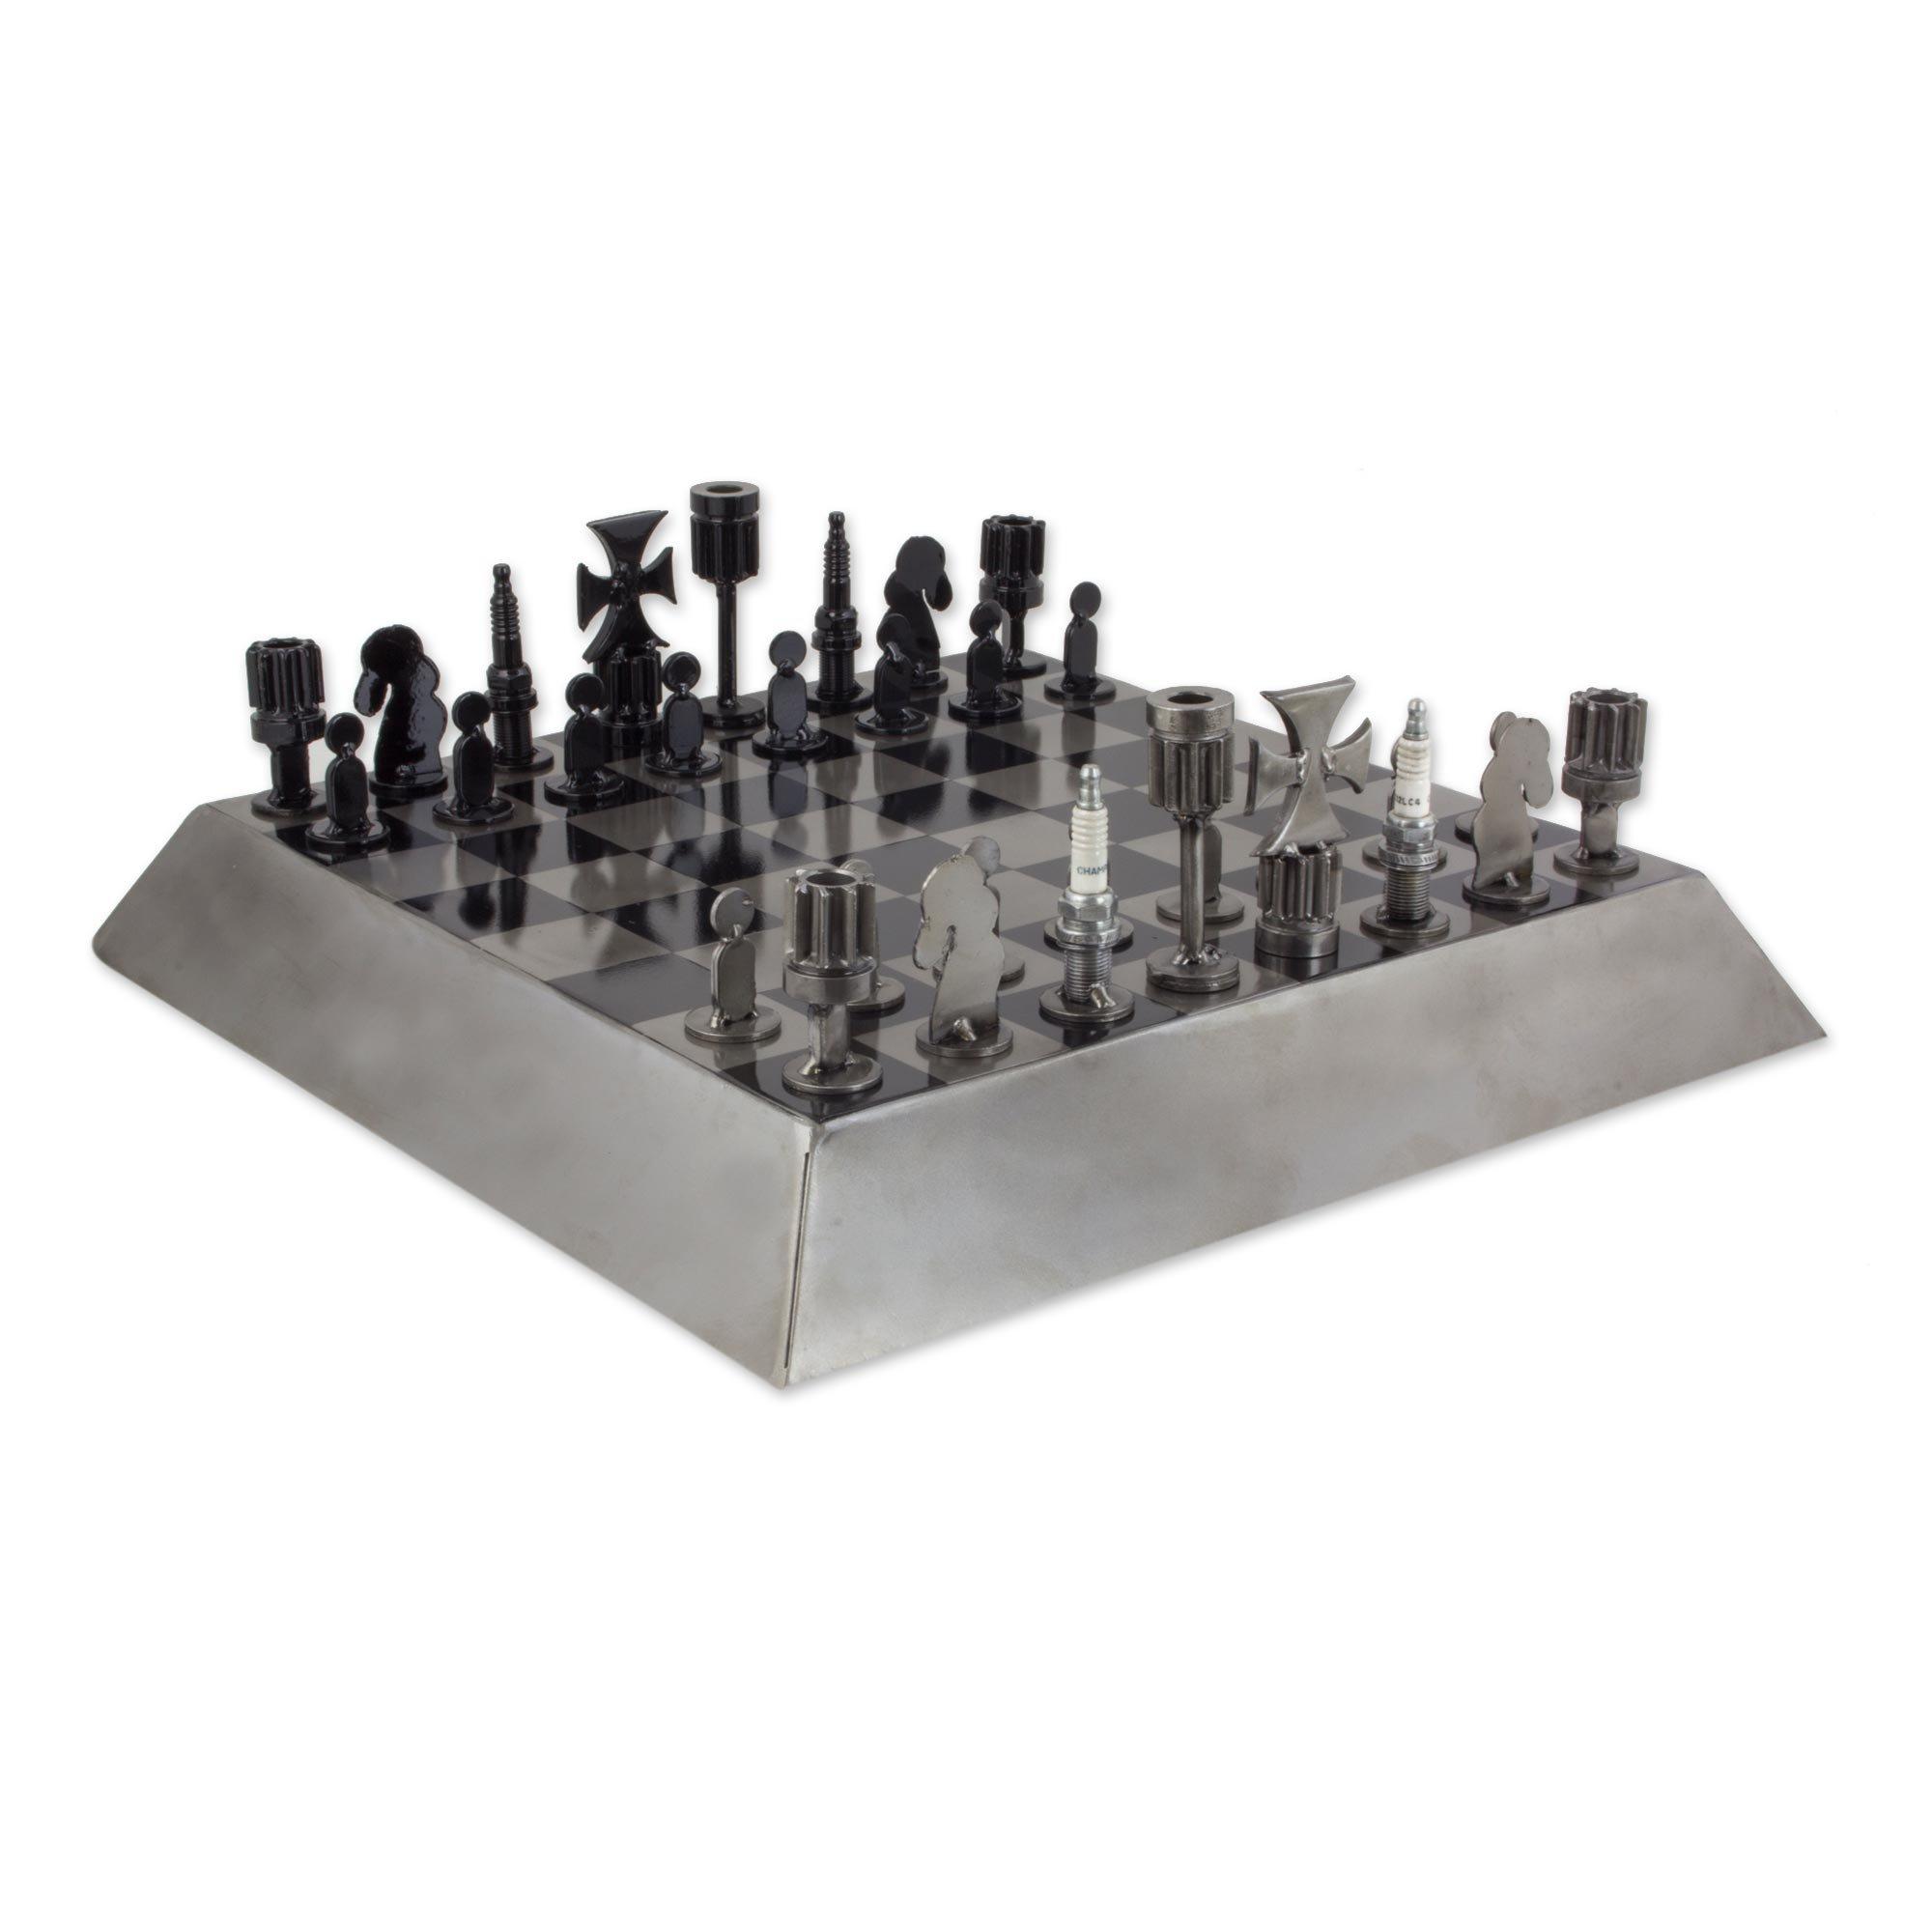 NOVICA Metallic Steel Recycled Metal Chess Sets 'Rustic Pyramid'